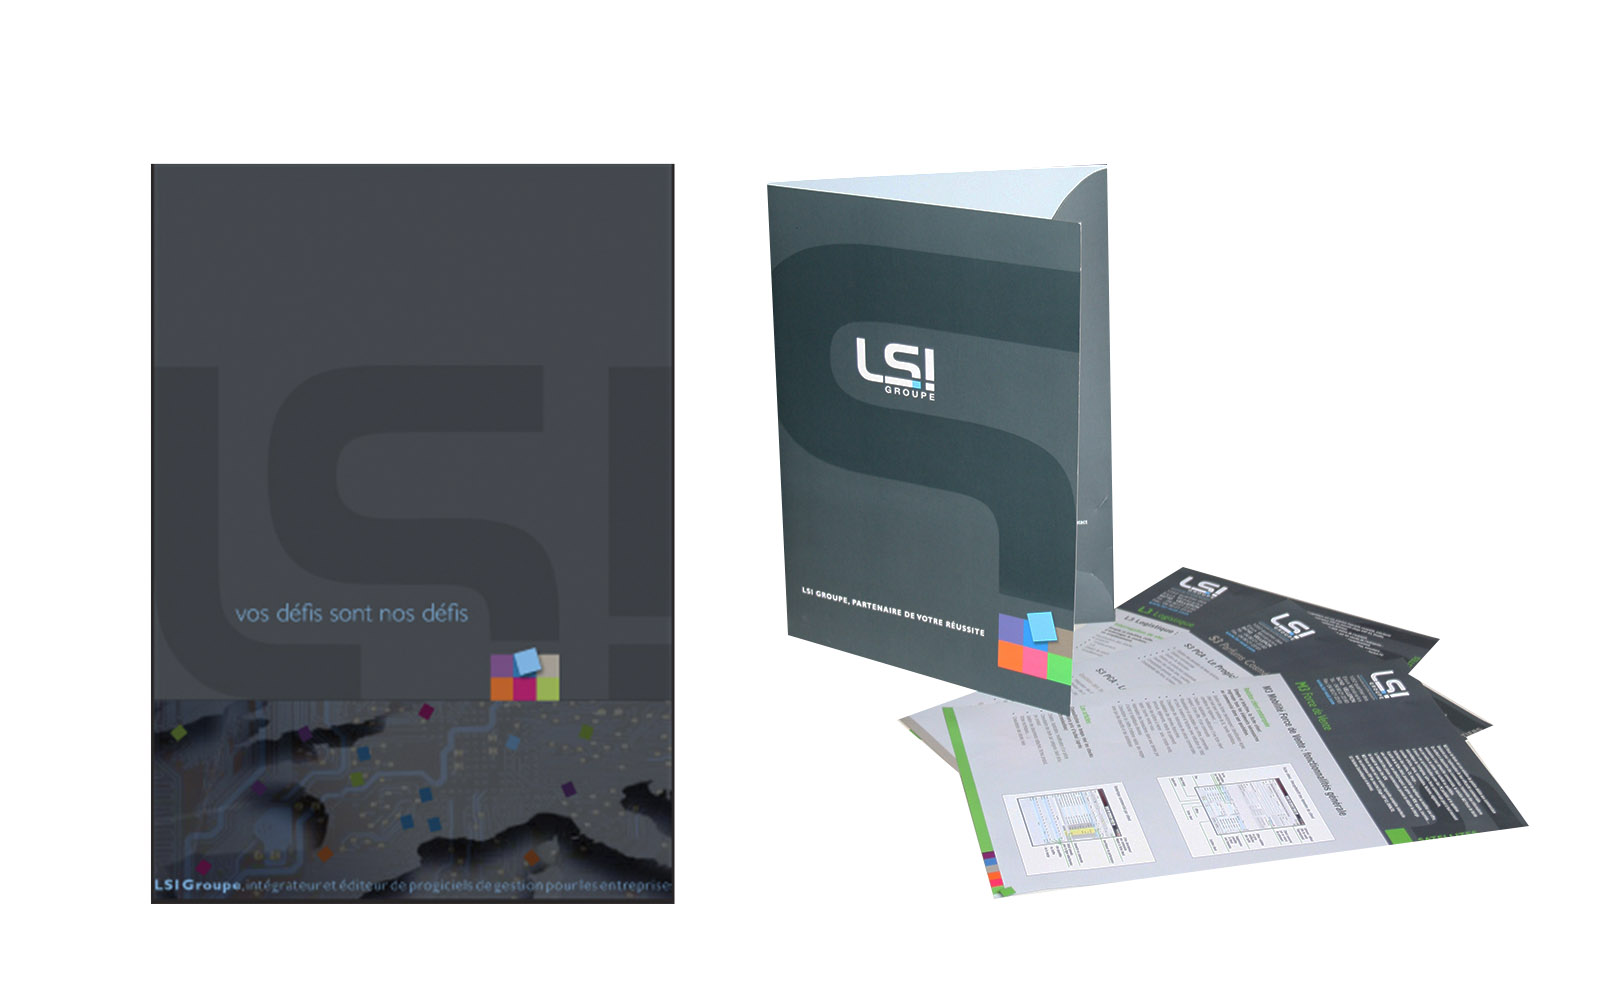 LSI-1